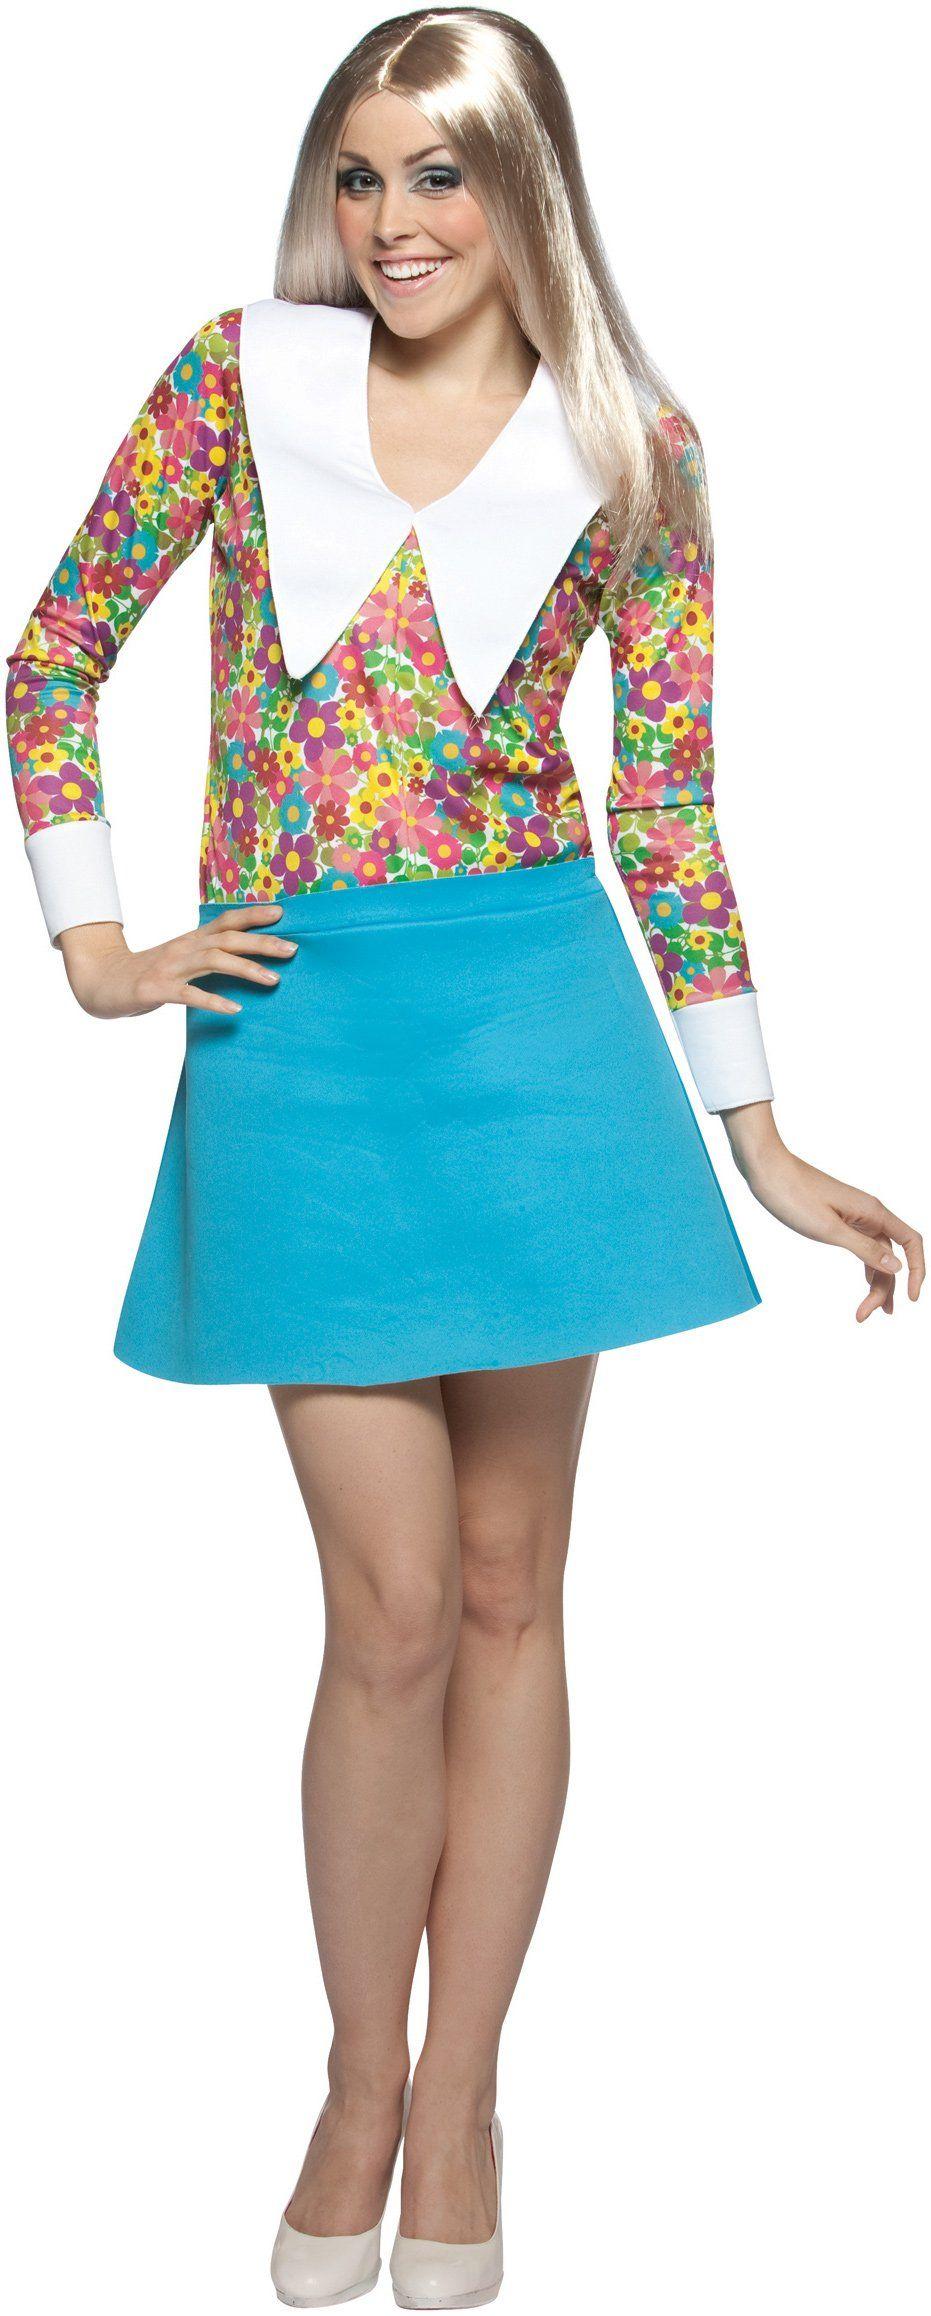 Marsha Brady ) Costumes for women, Costume shop, Adult